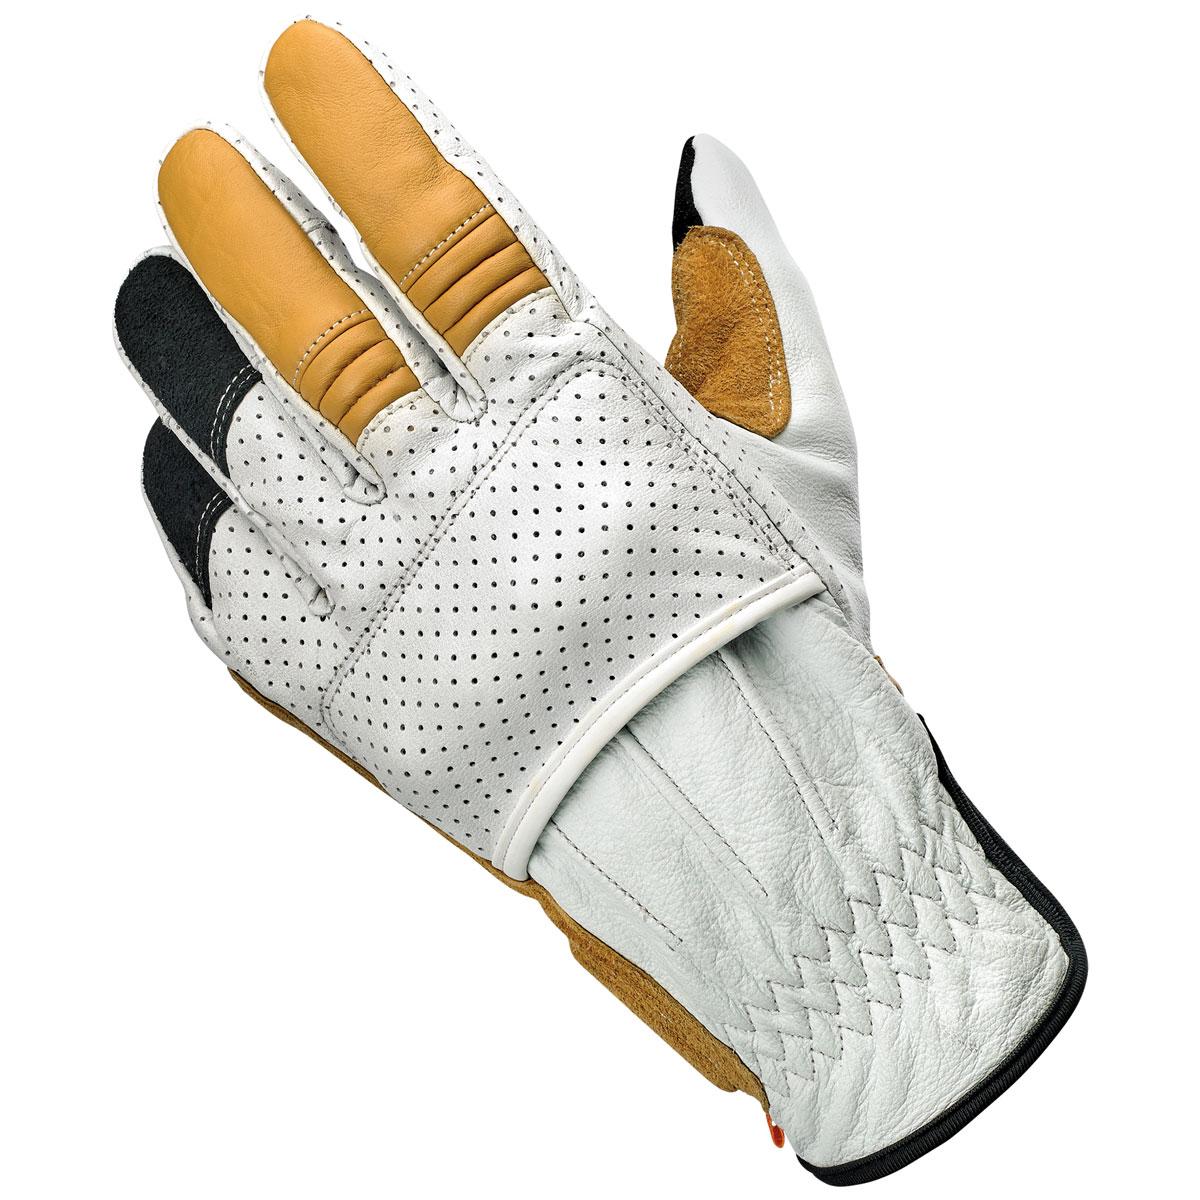 Biltwell Inc. Men's Borrego Cement Leather Gloves